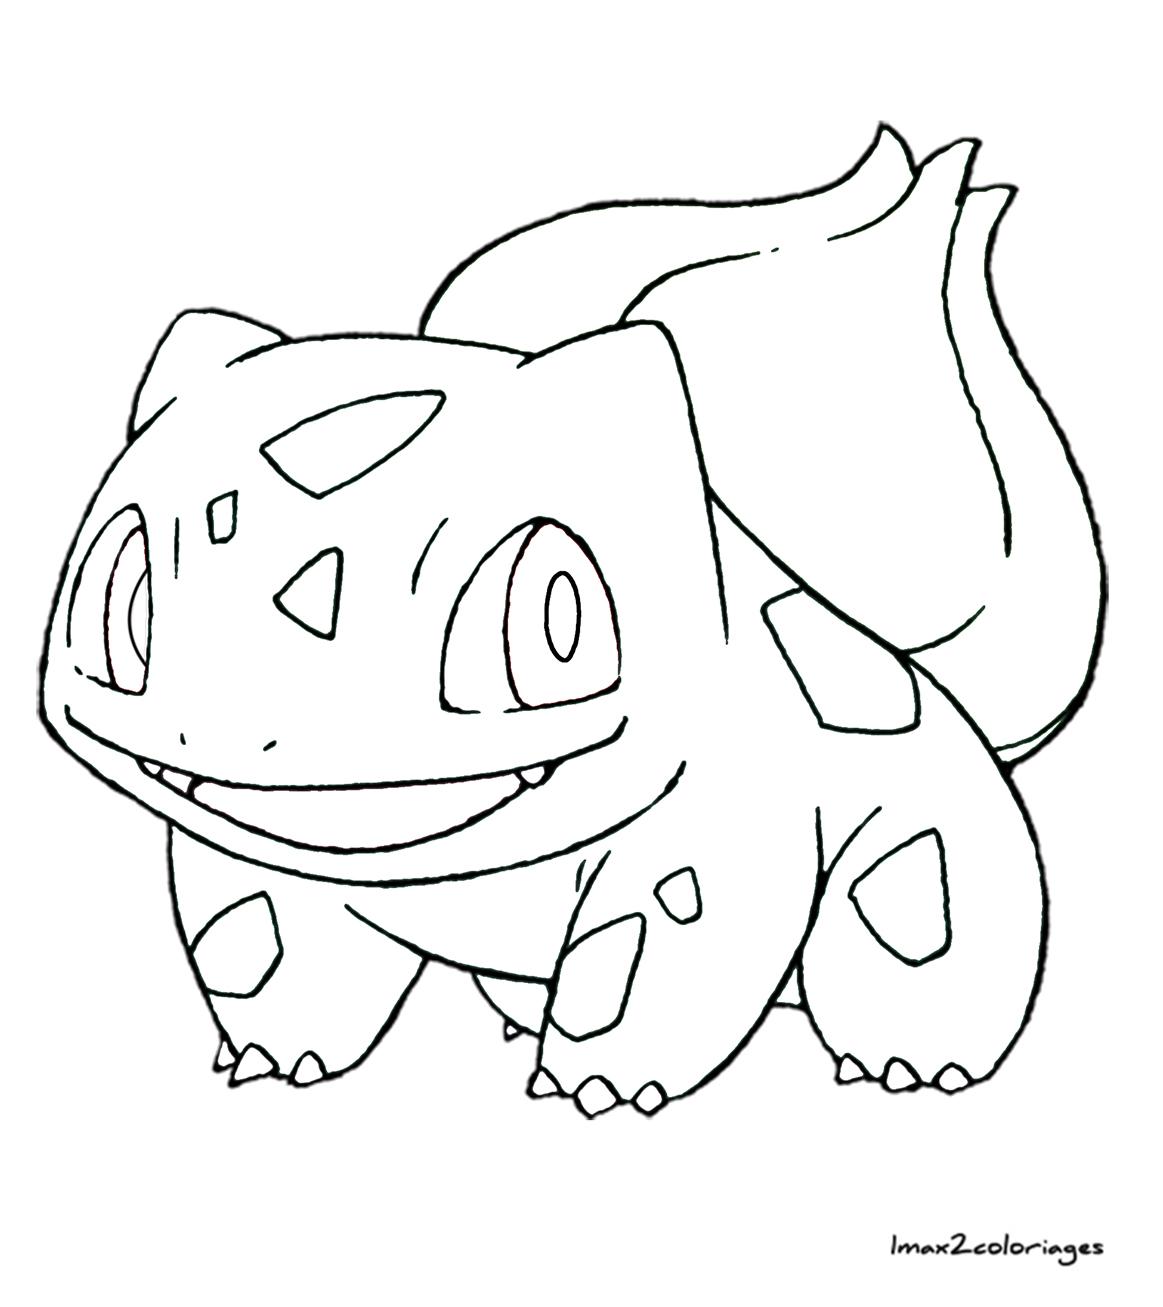 Coloriages Pokemon Bulbizarre